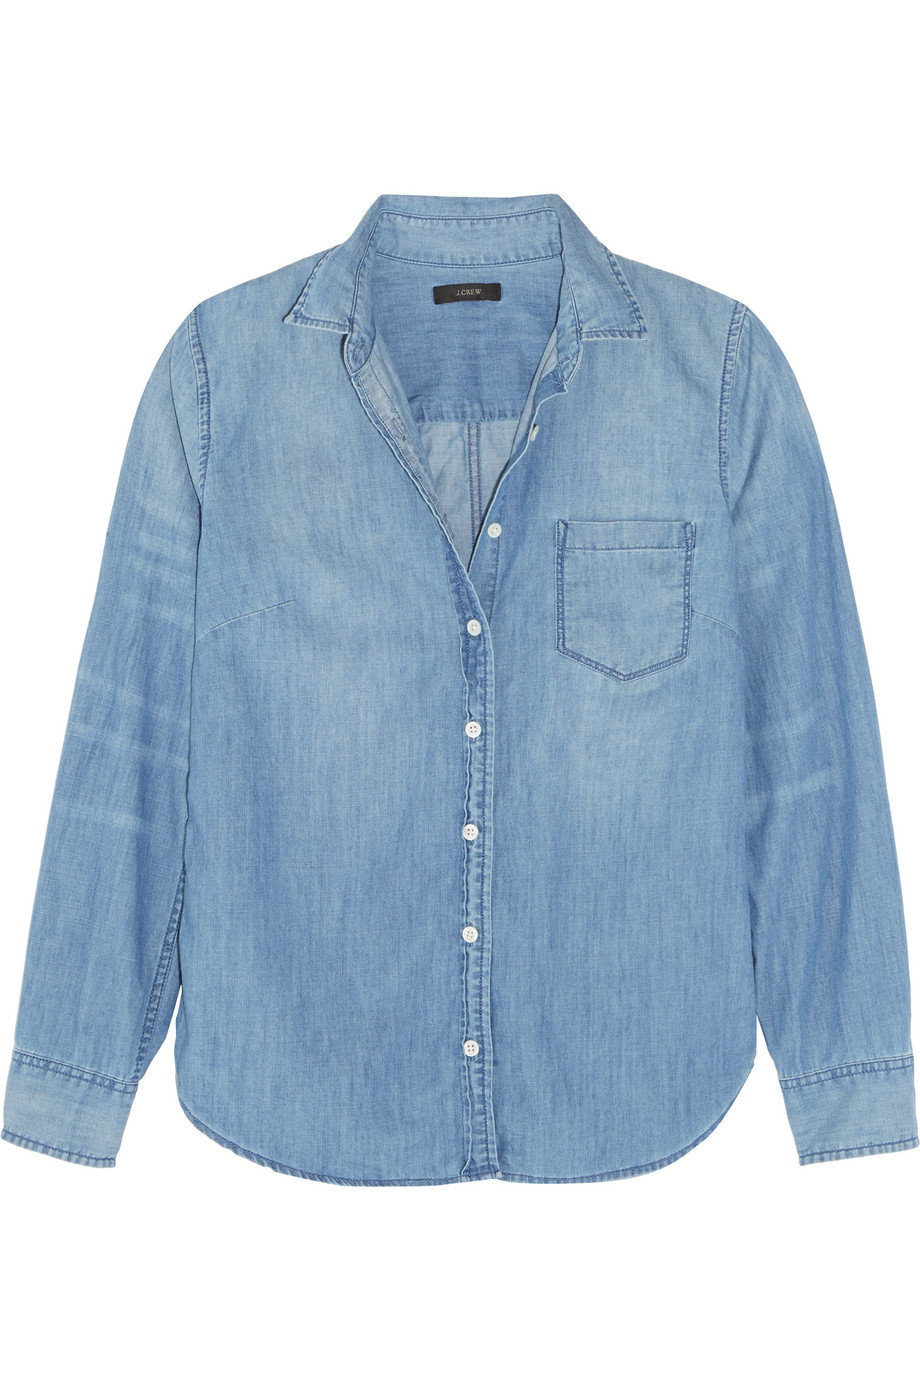 J.Crew Cotton-Chambray Shirt, Size: 12